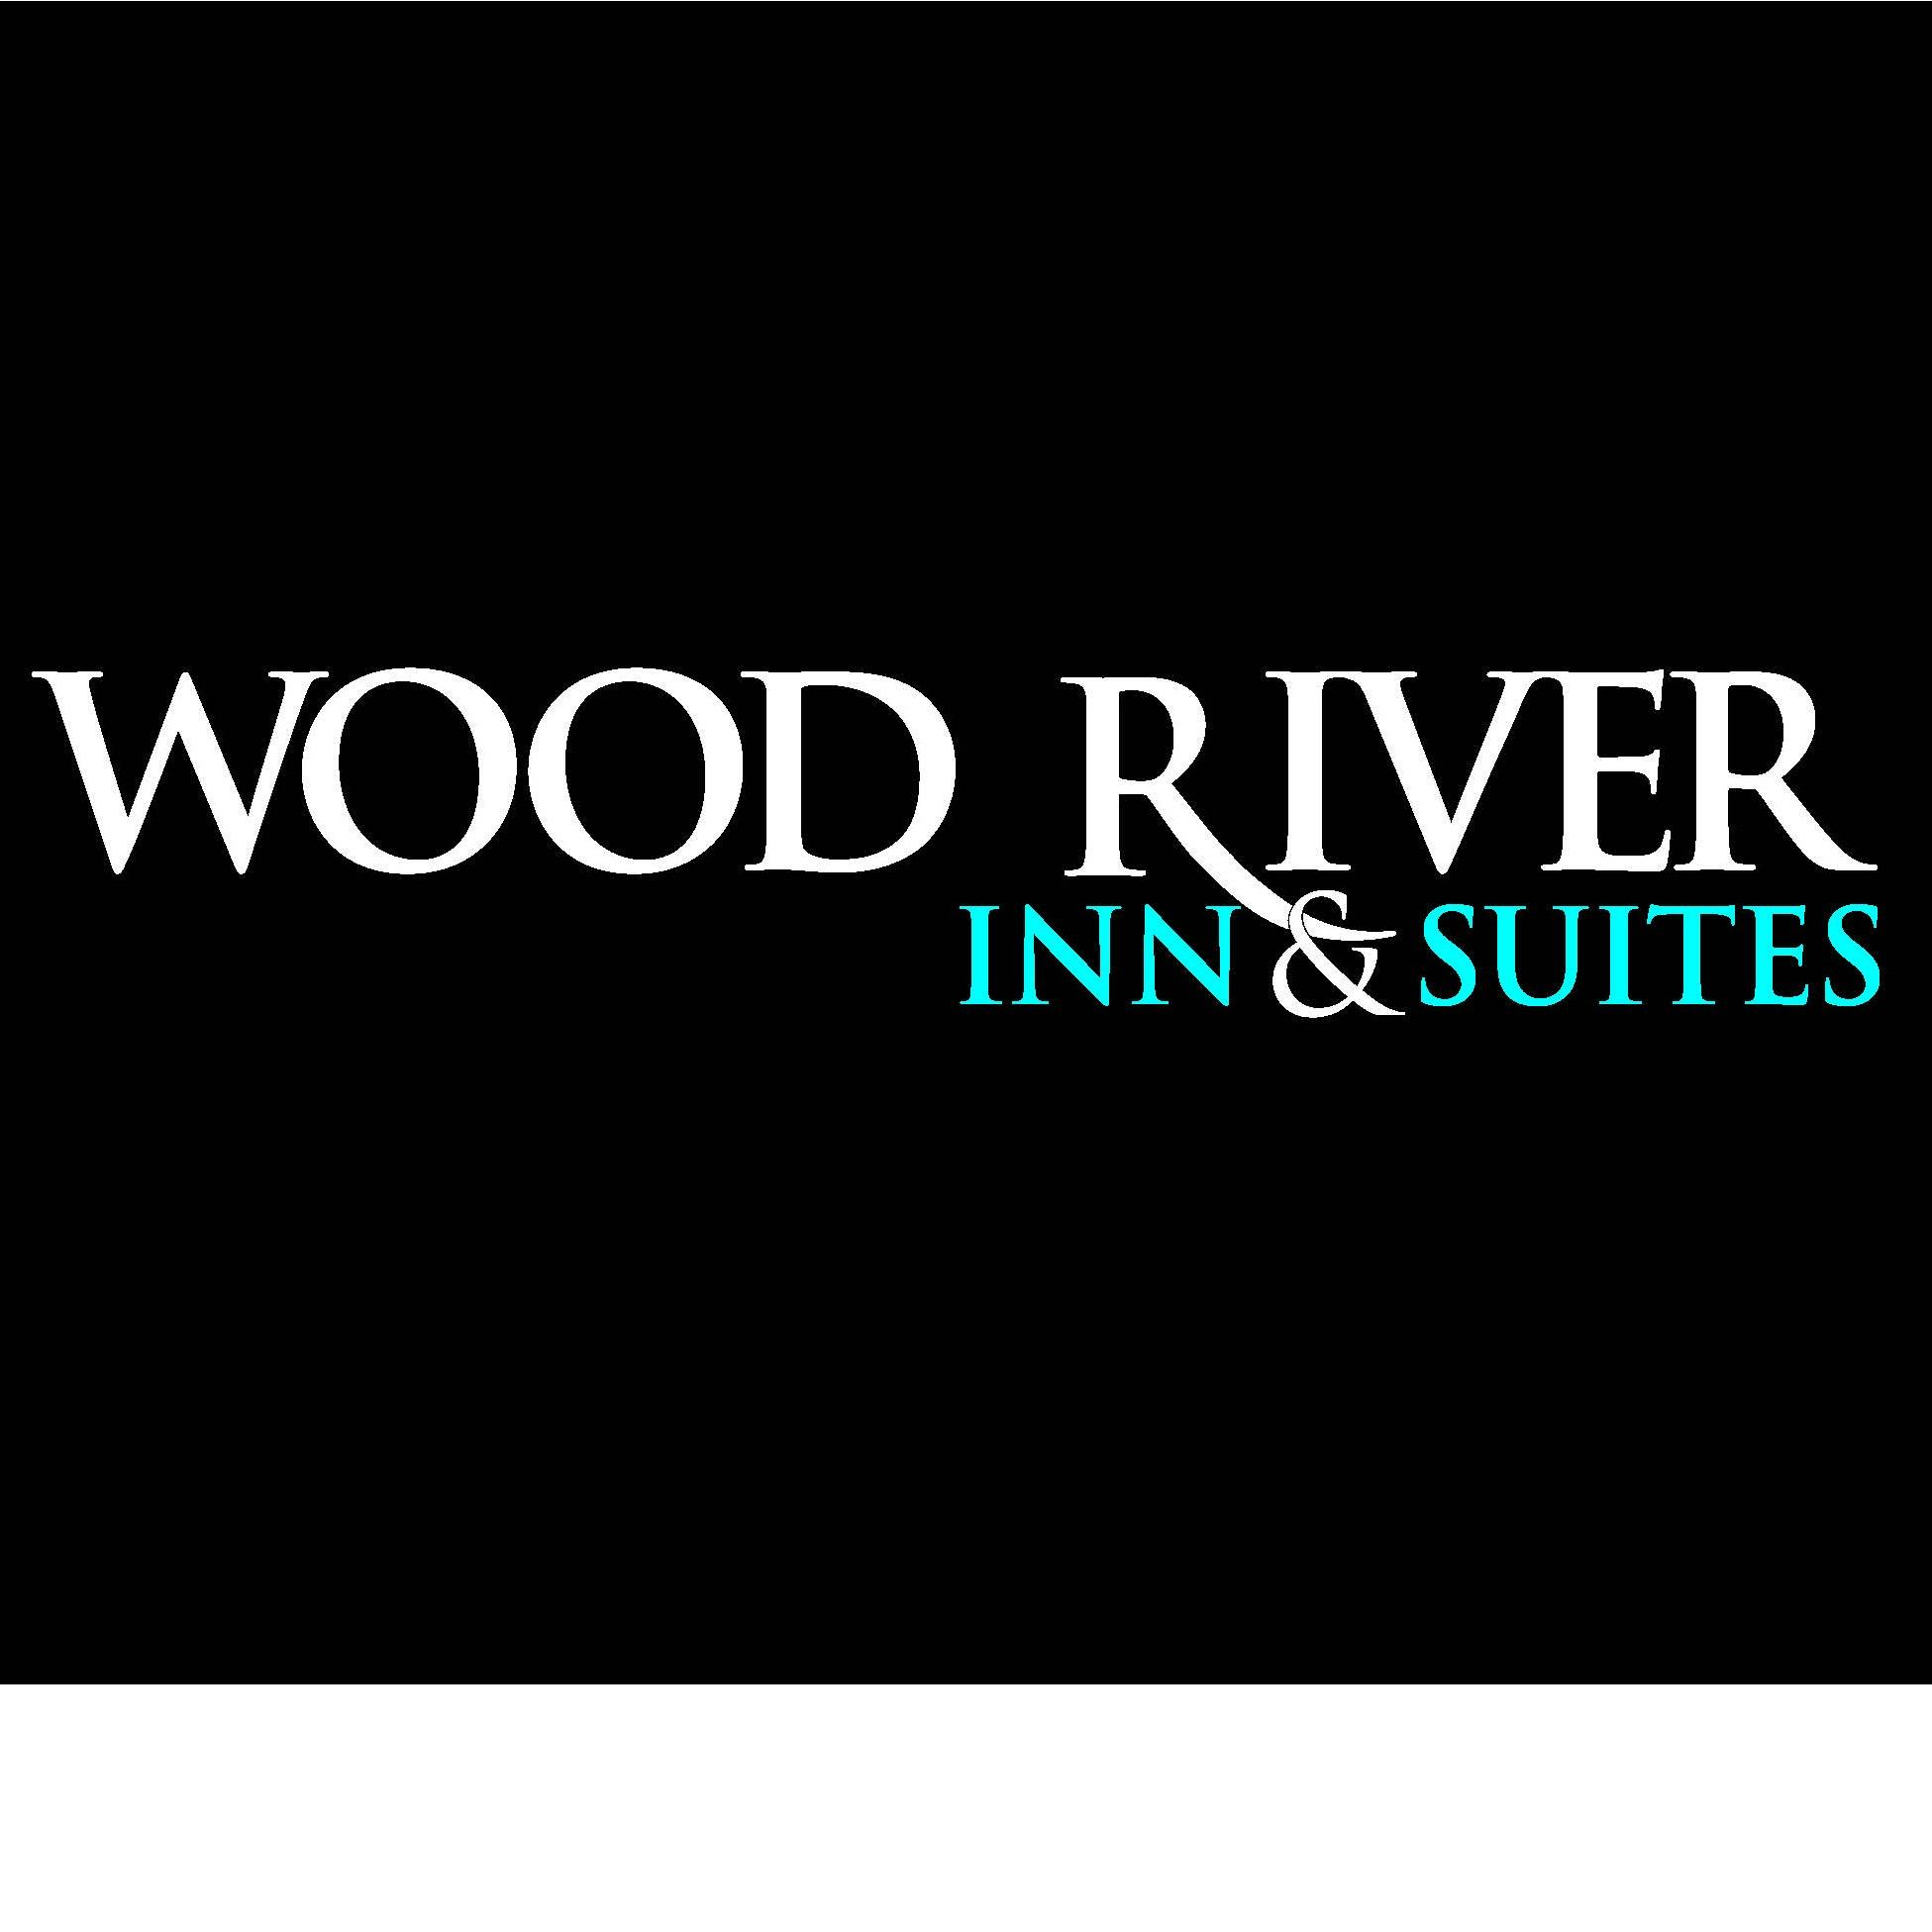 Wood River Inn & Suites image 5